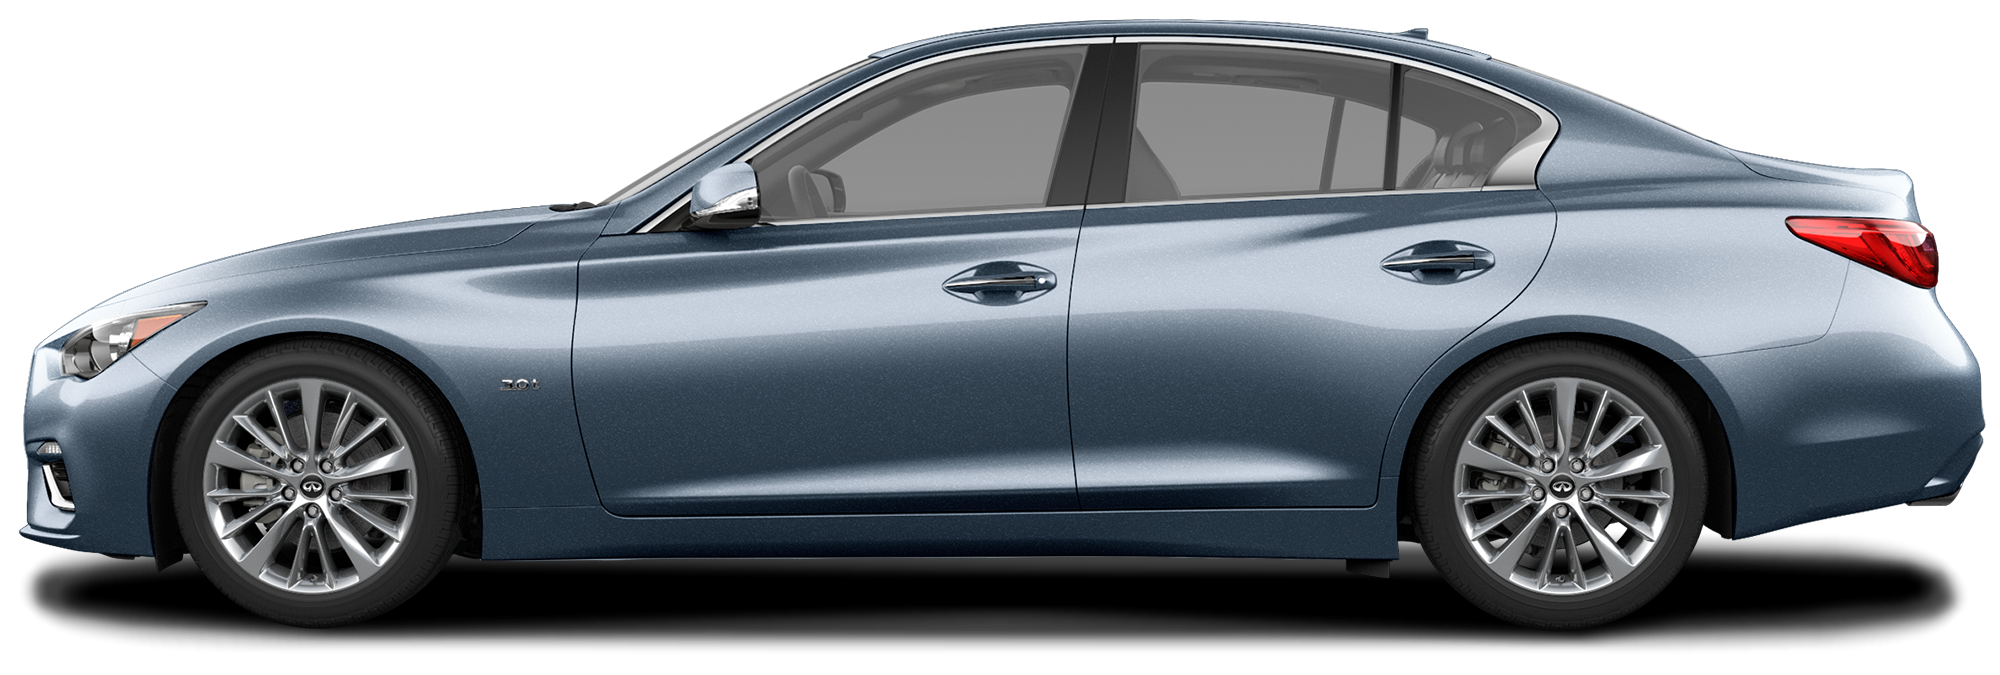 2020 INFINITI Q50 Sedan 3.0t LUXE